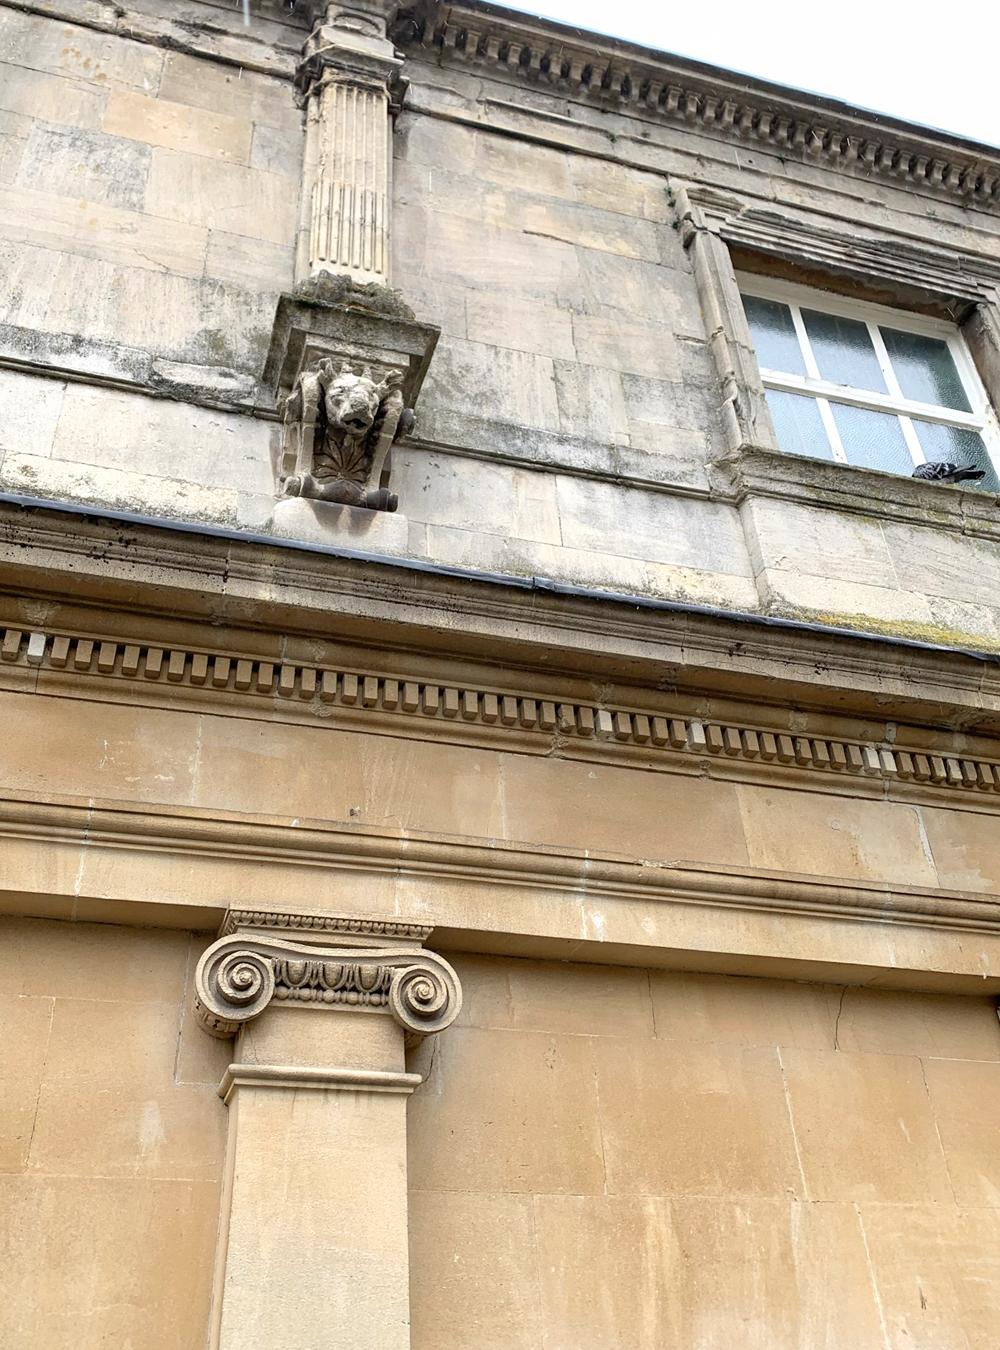 Roman architecture in Bath - Emma Louise Layla, UK travel & lifestyle blog